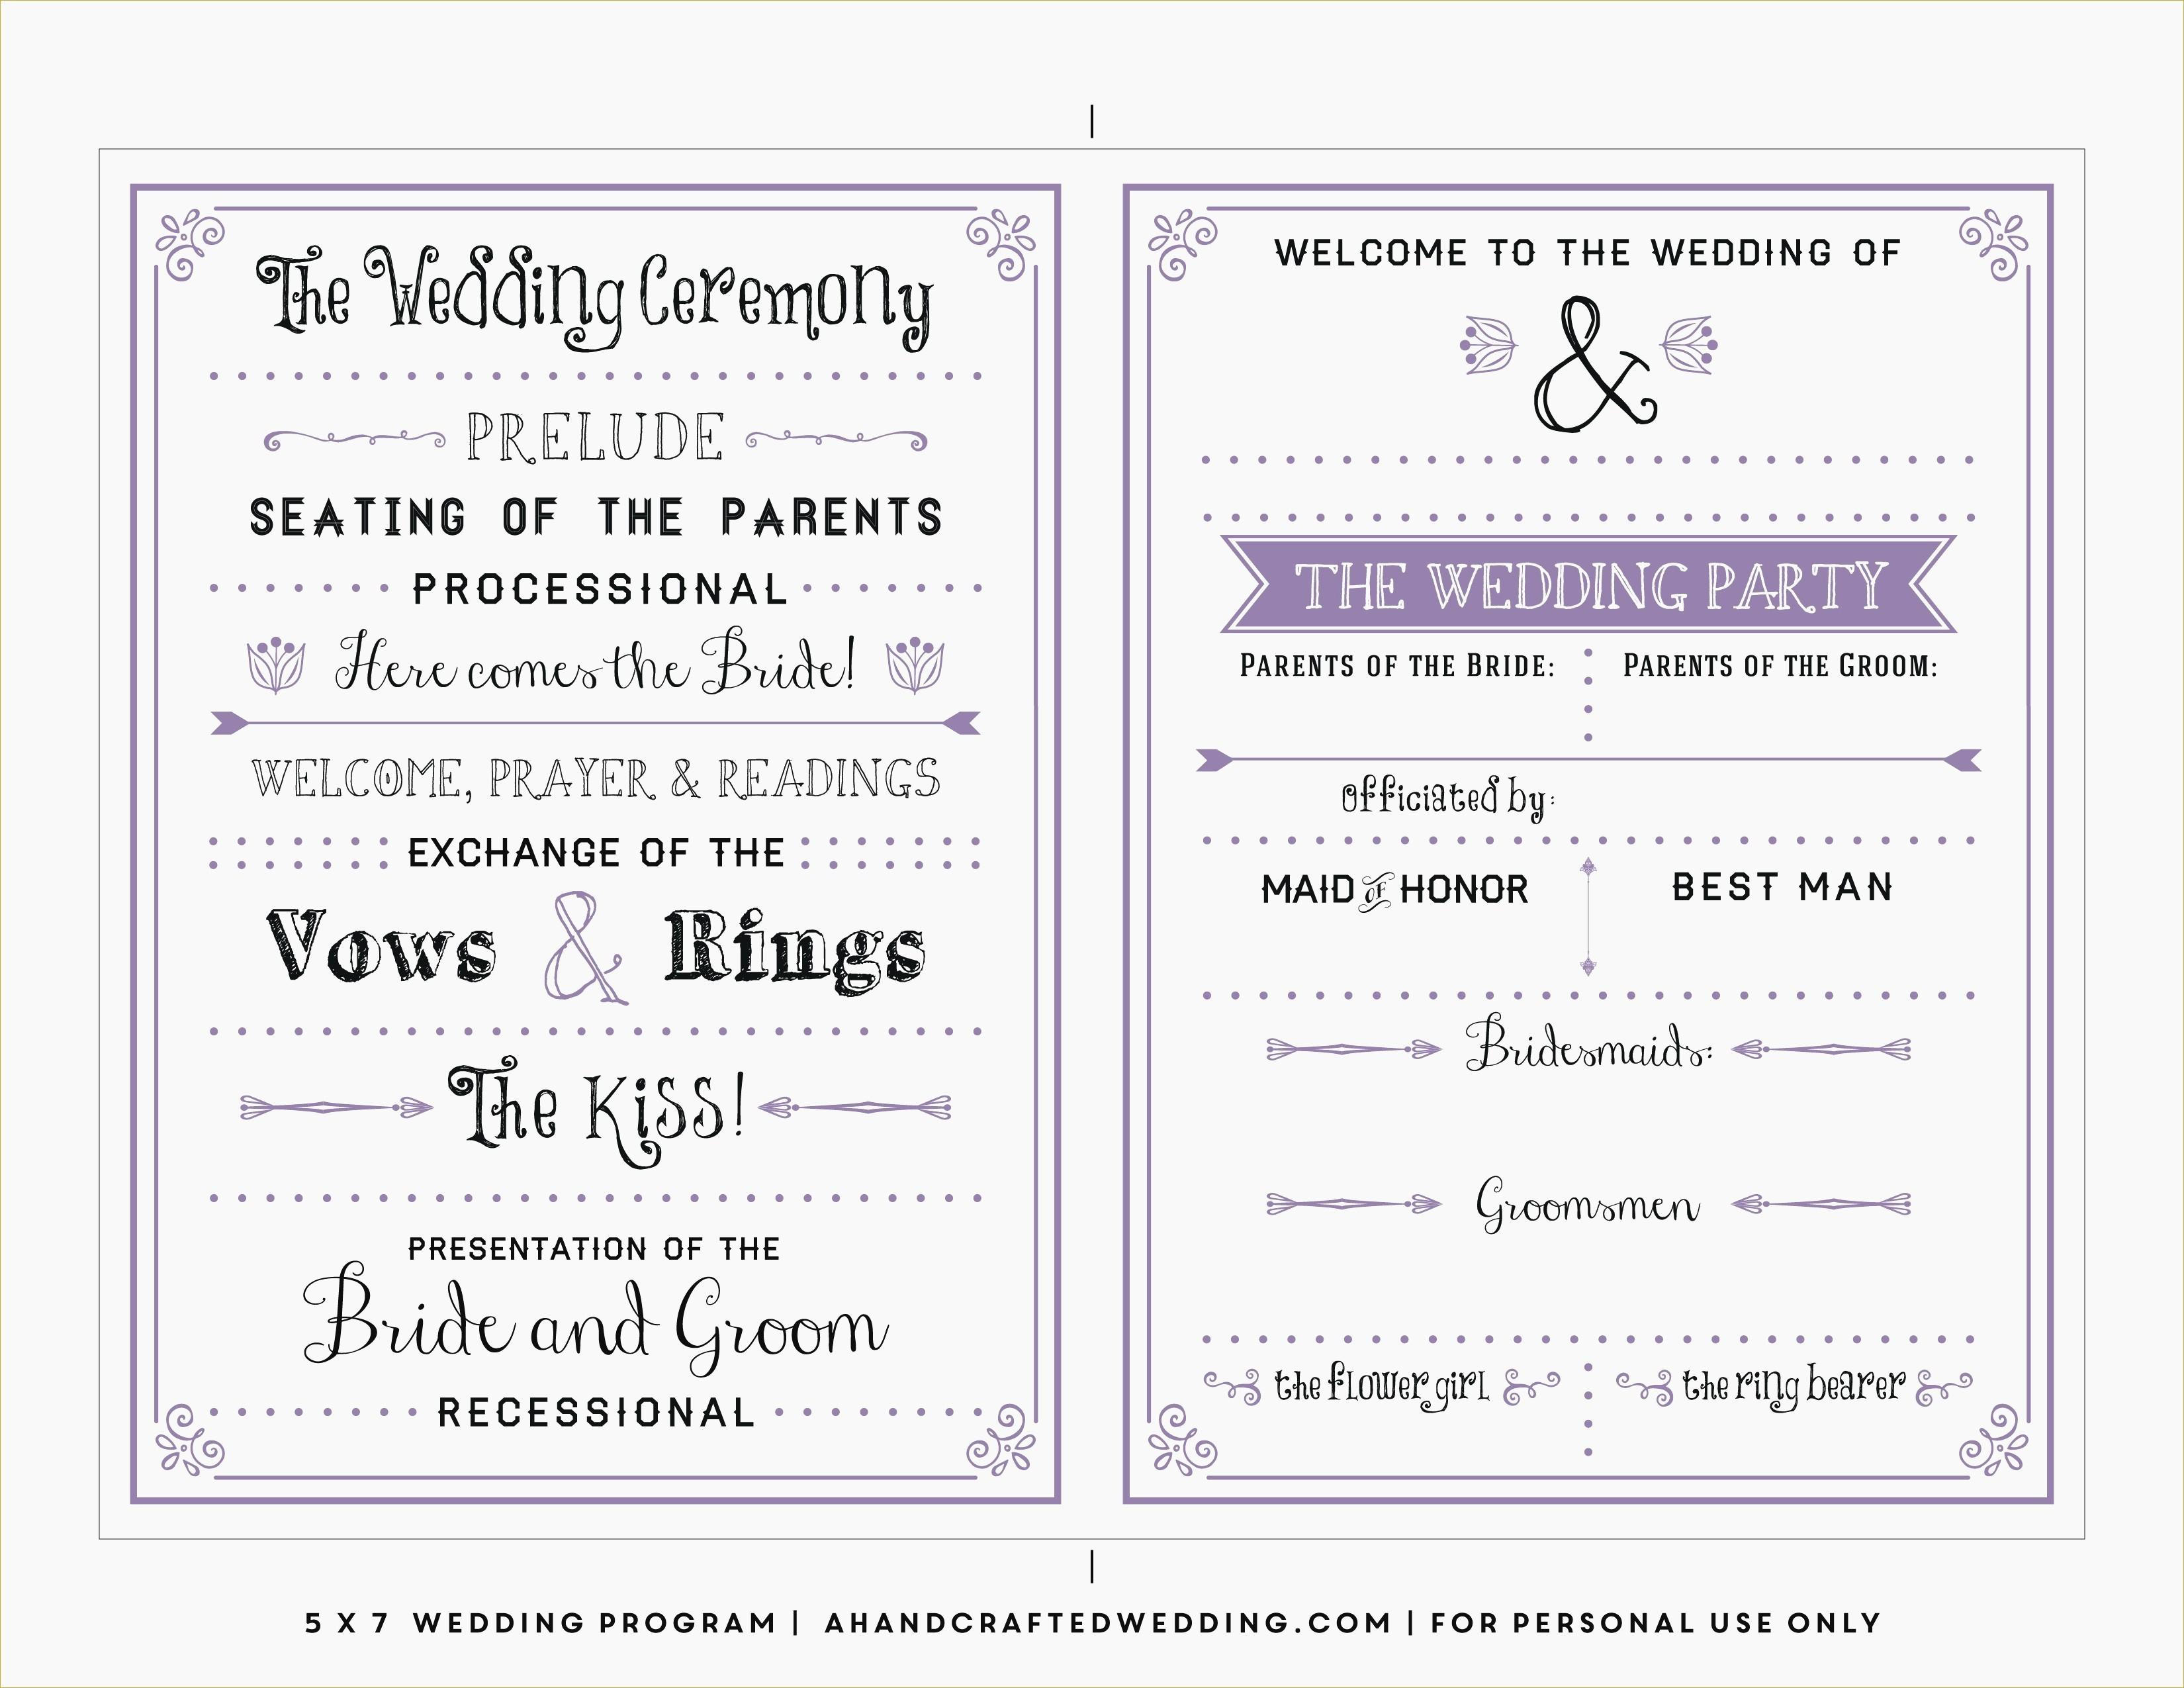 001 Free Printable Wedding Program Templates Word Sample Documents - Free Printable Fan Wedding Programs